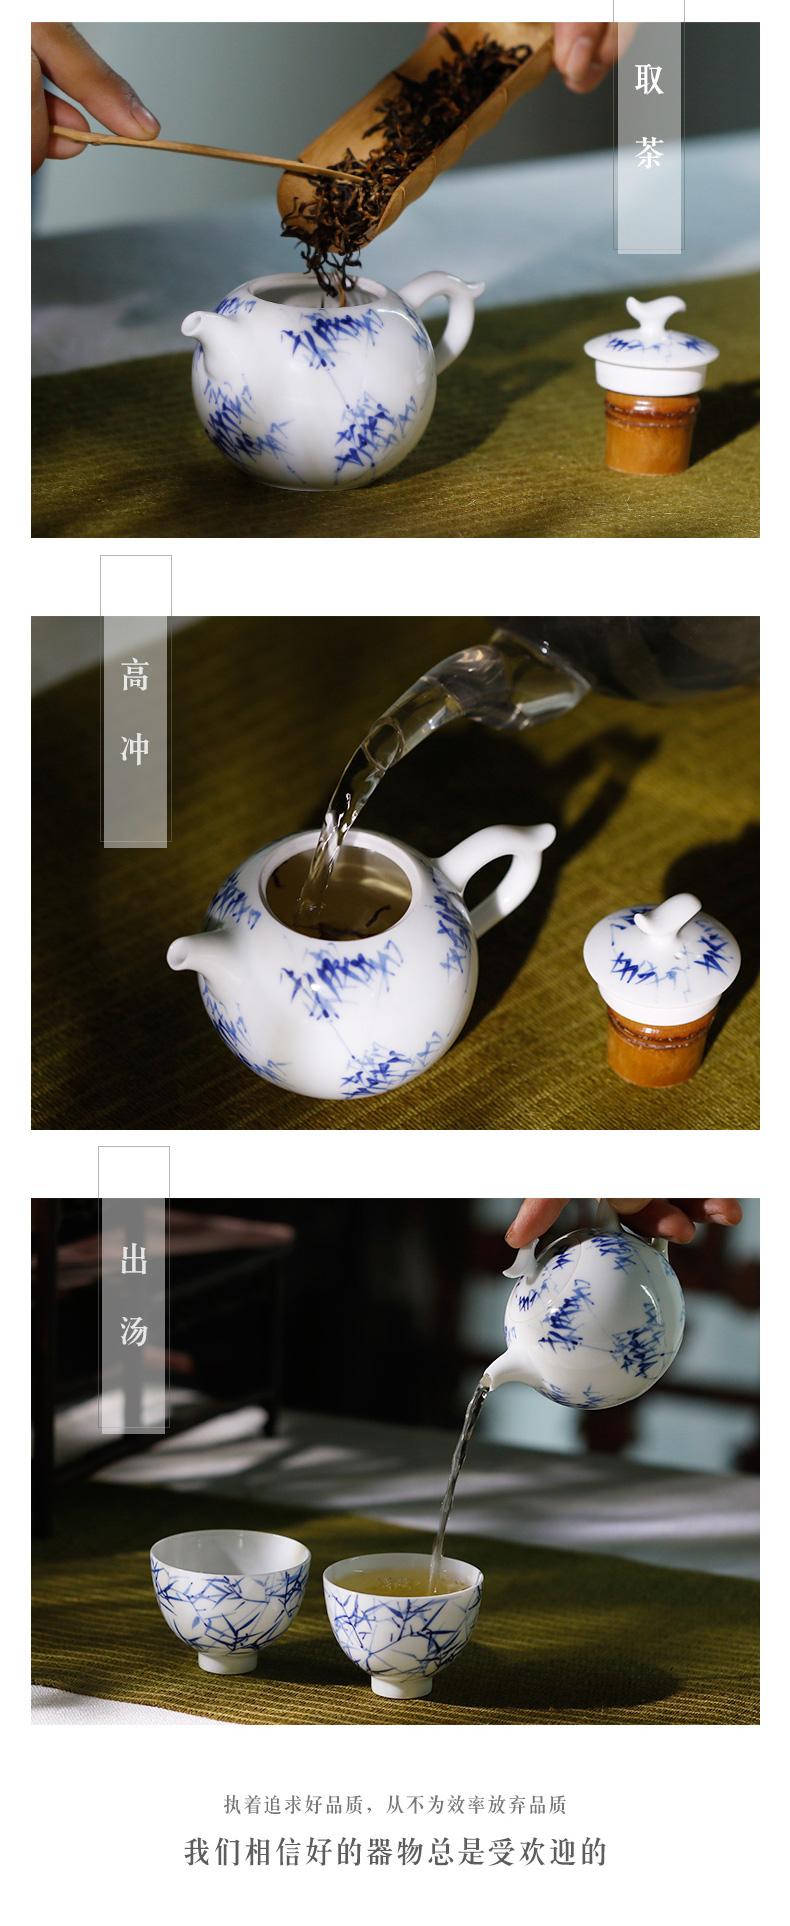 The three frequently do kung fu tea pot of jingdezhen ceramic tea set under glaze color porcelain miniature S22007 tea machine